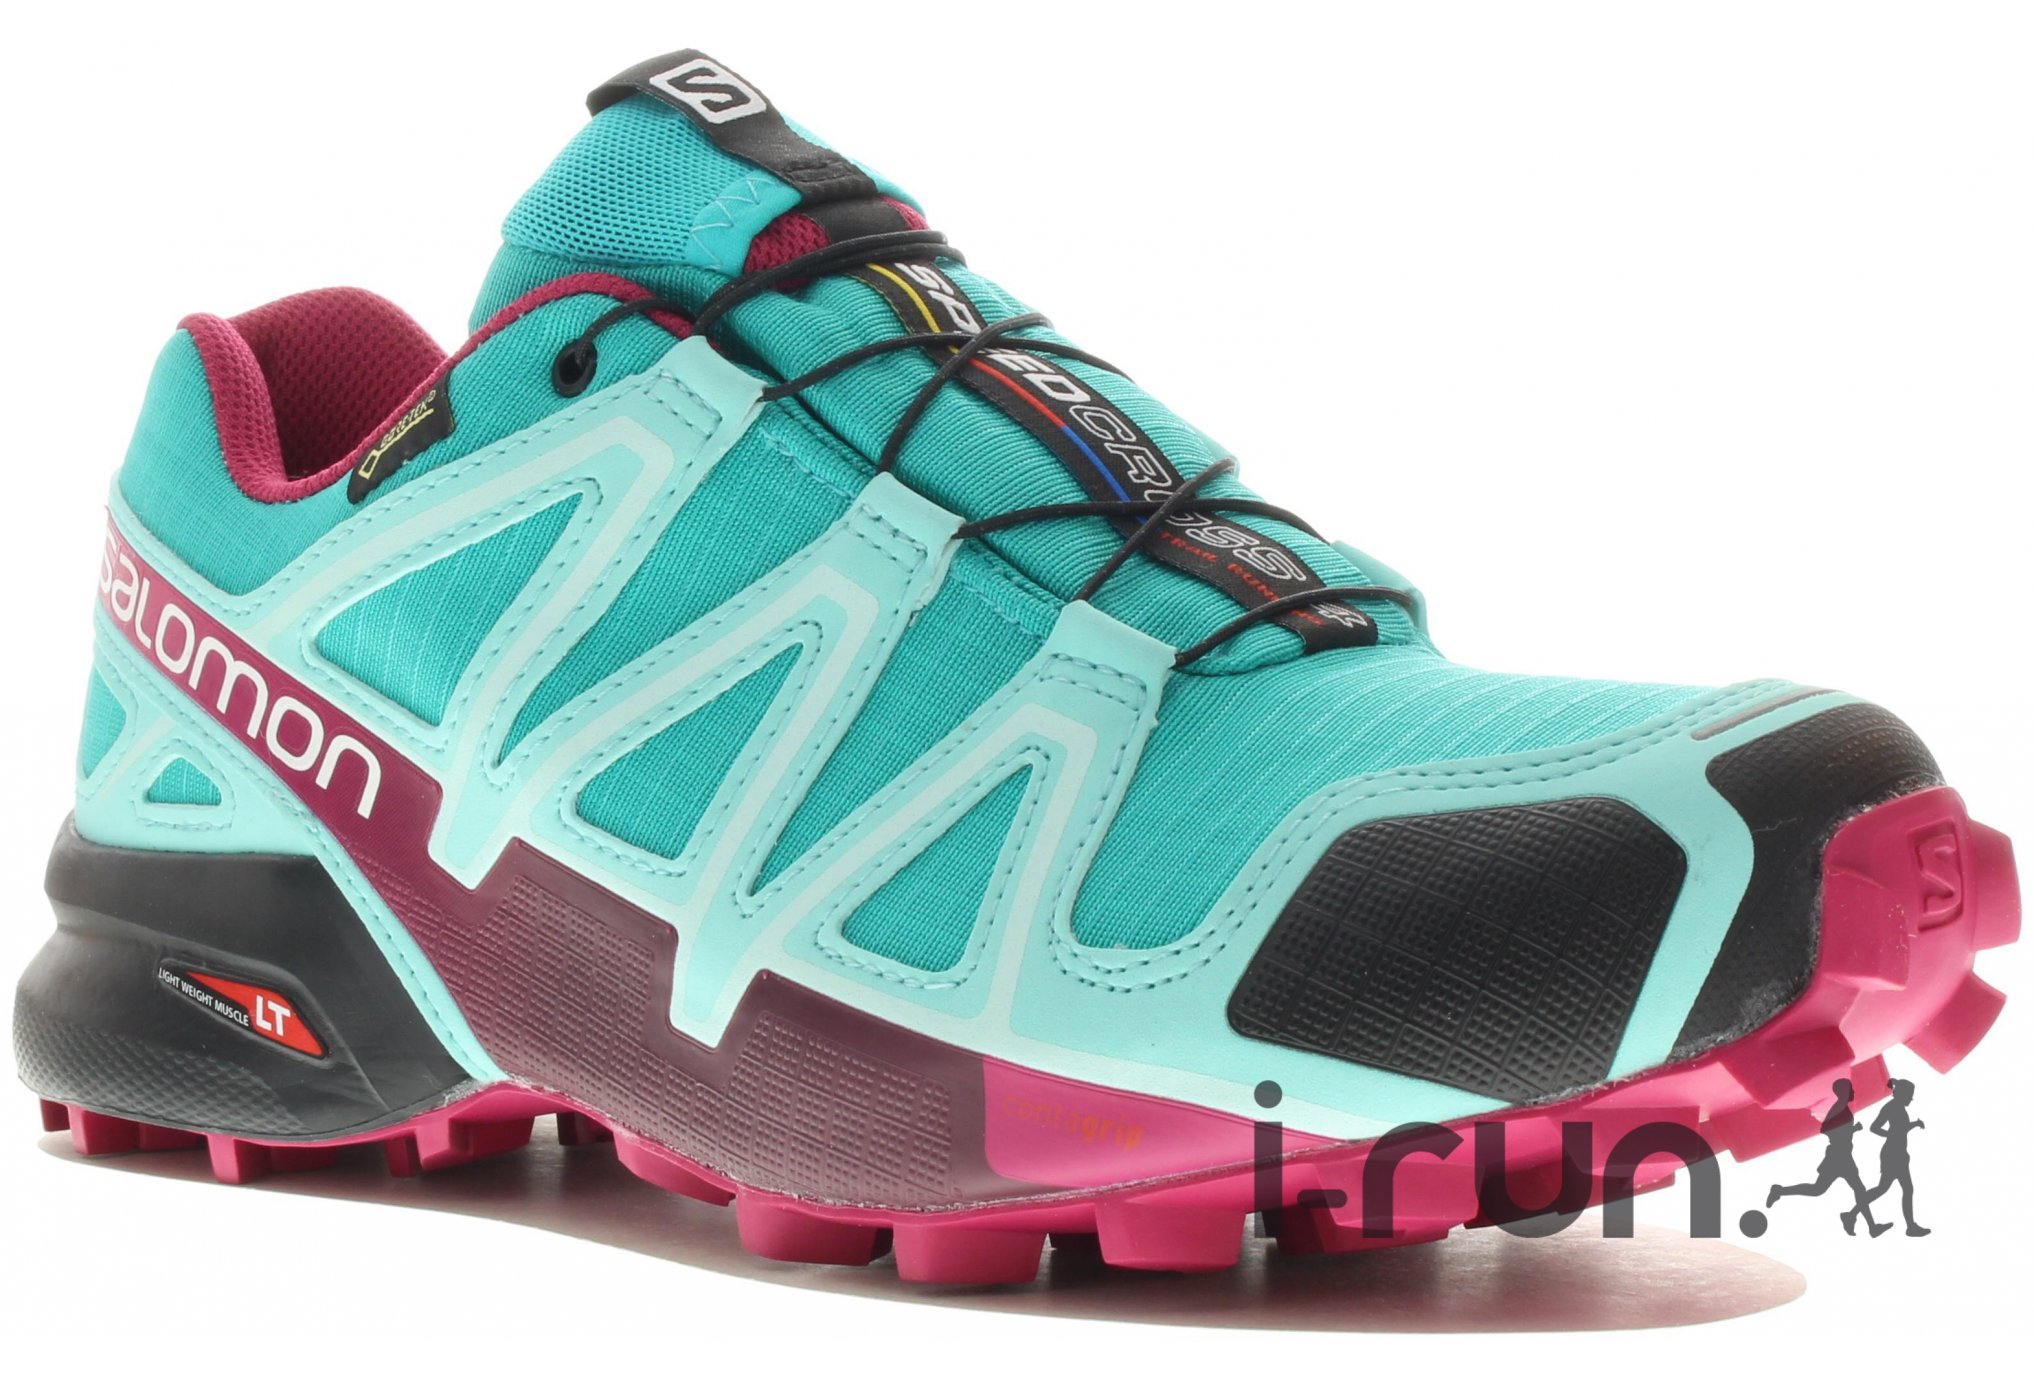 W Uag 0 Salomon Running Femme Slide Rx 3 Chaussures At Z1thxwqz OaqWY